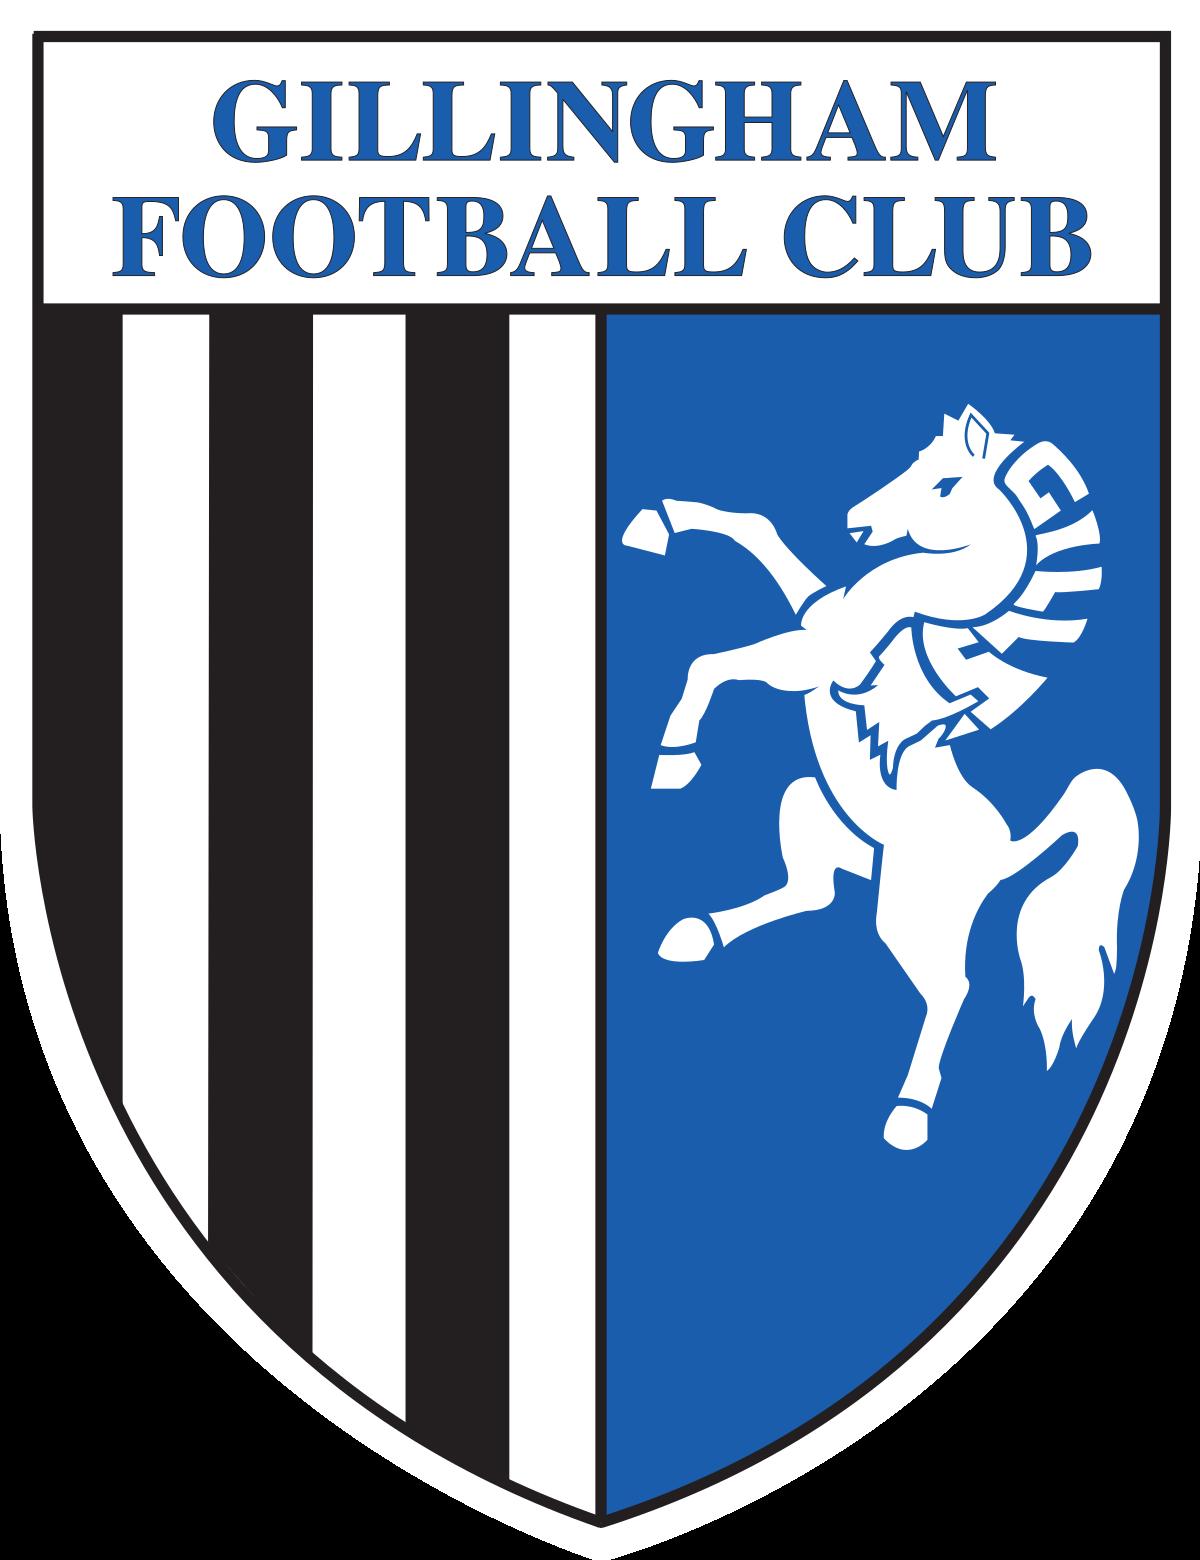 The Logo Of Gillingham Football Club